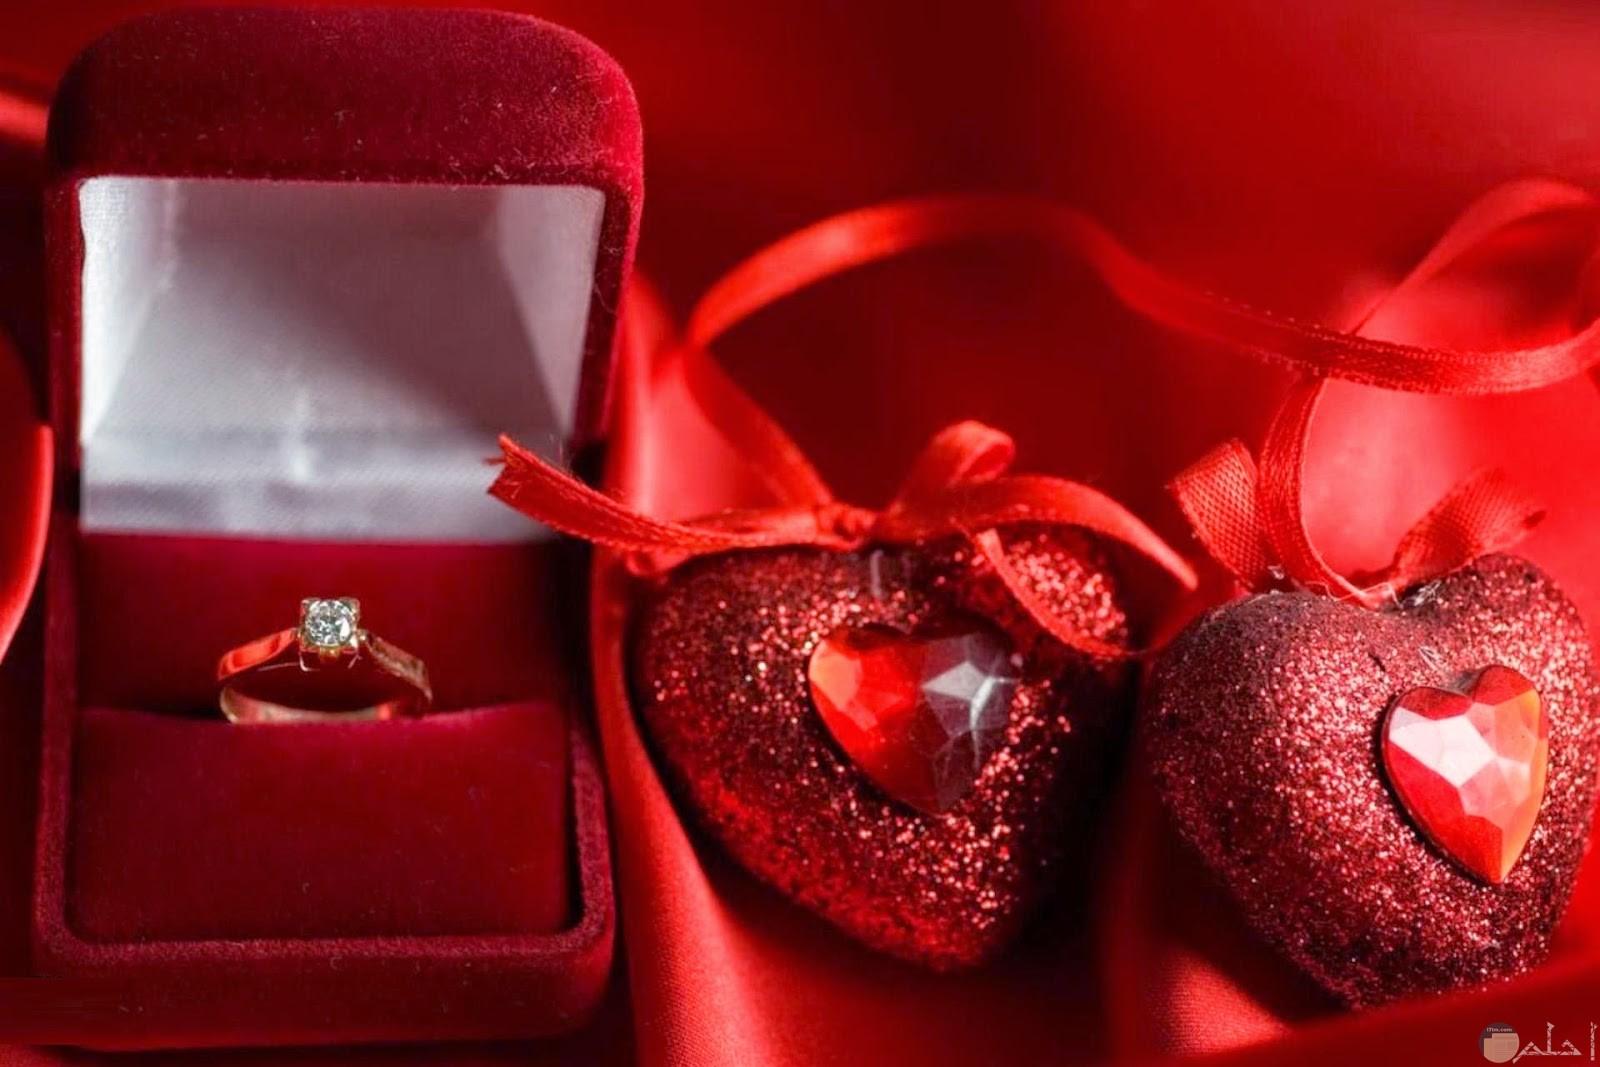 قلبين لونهم احمر بجوار علبه بها خاتم